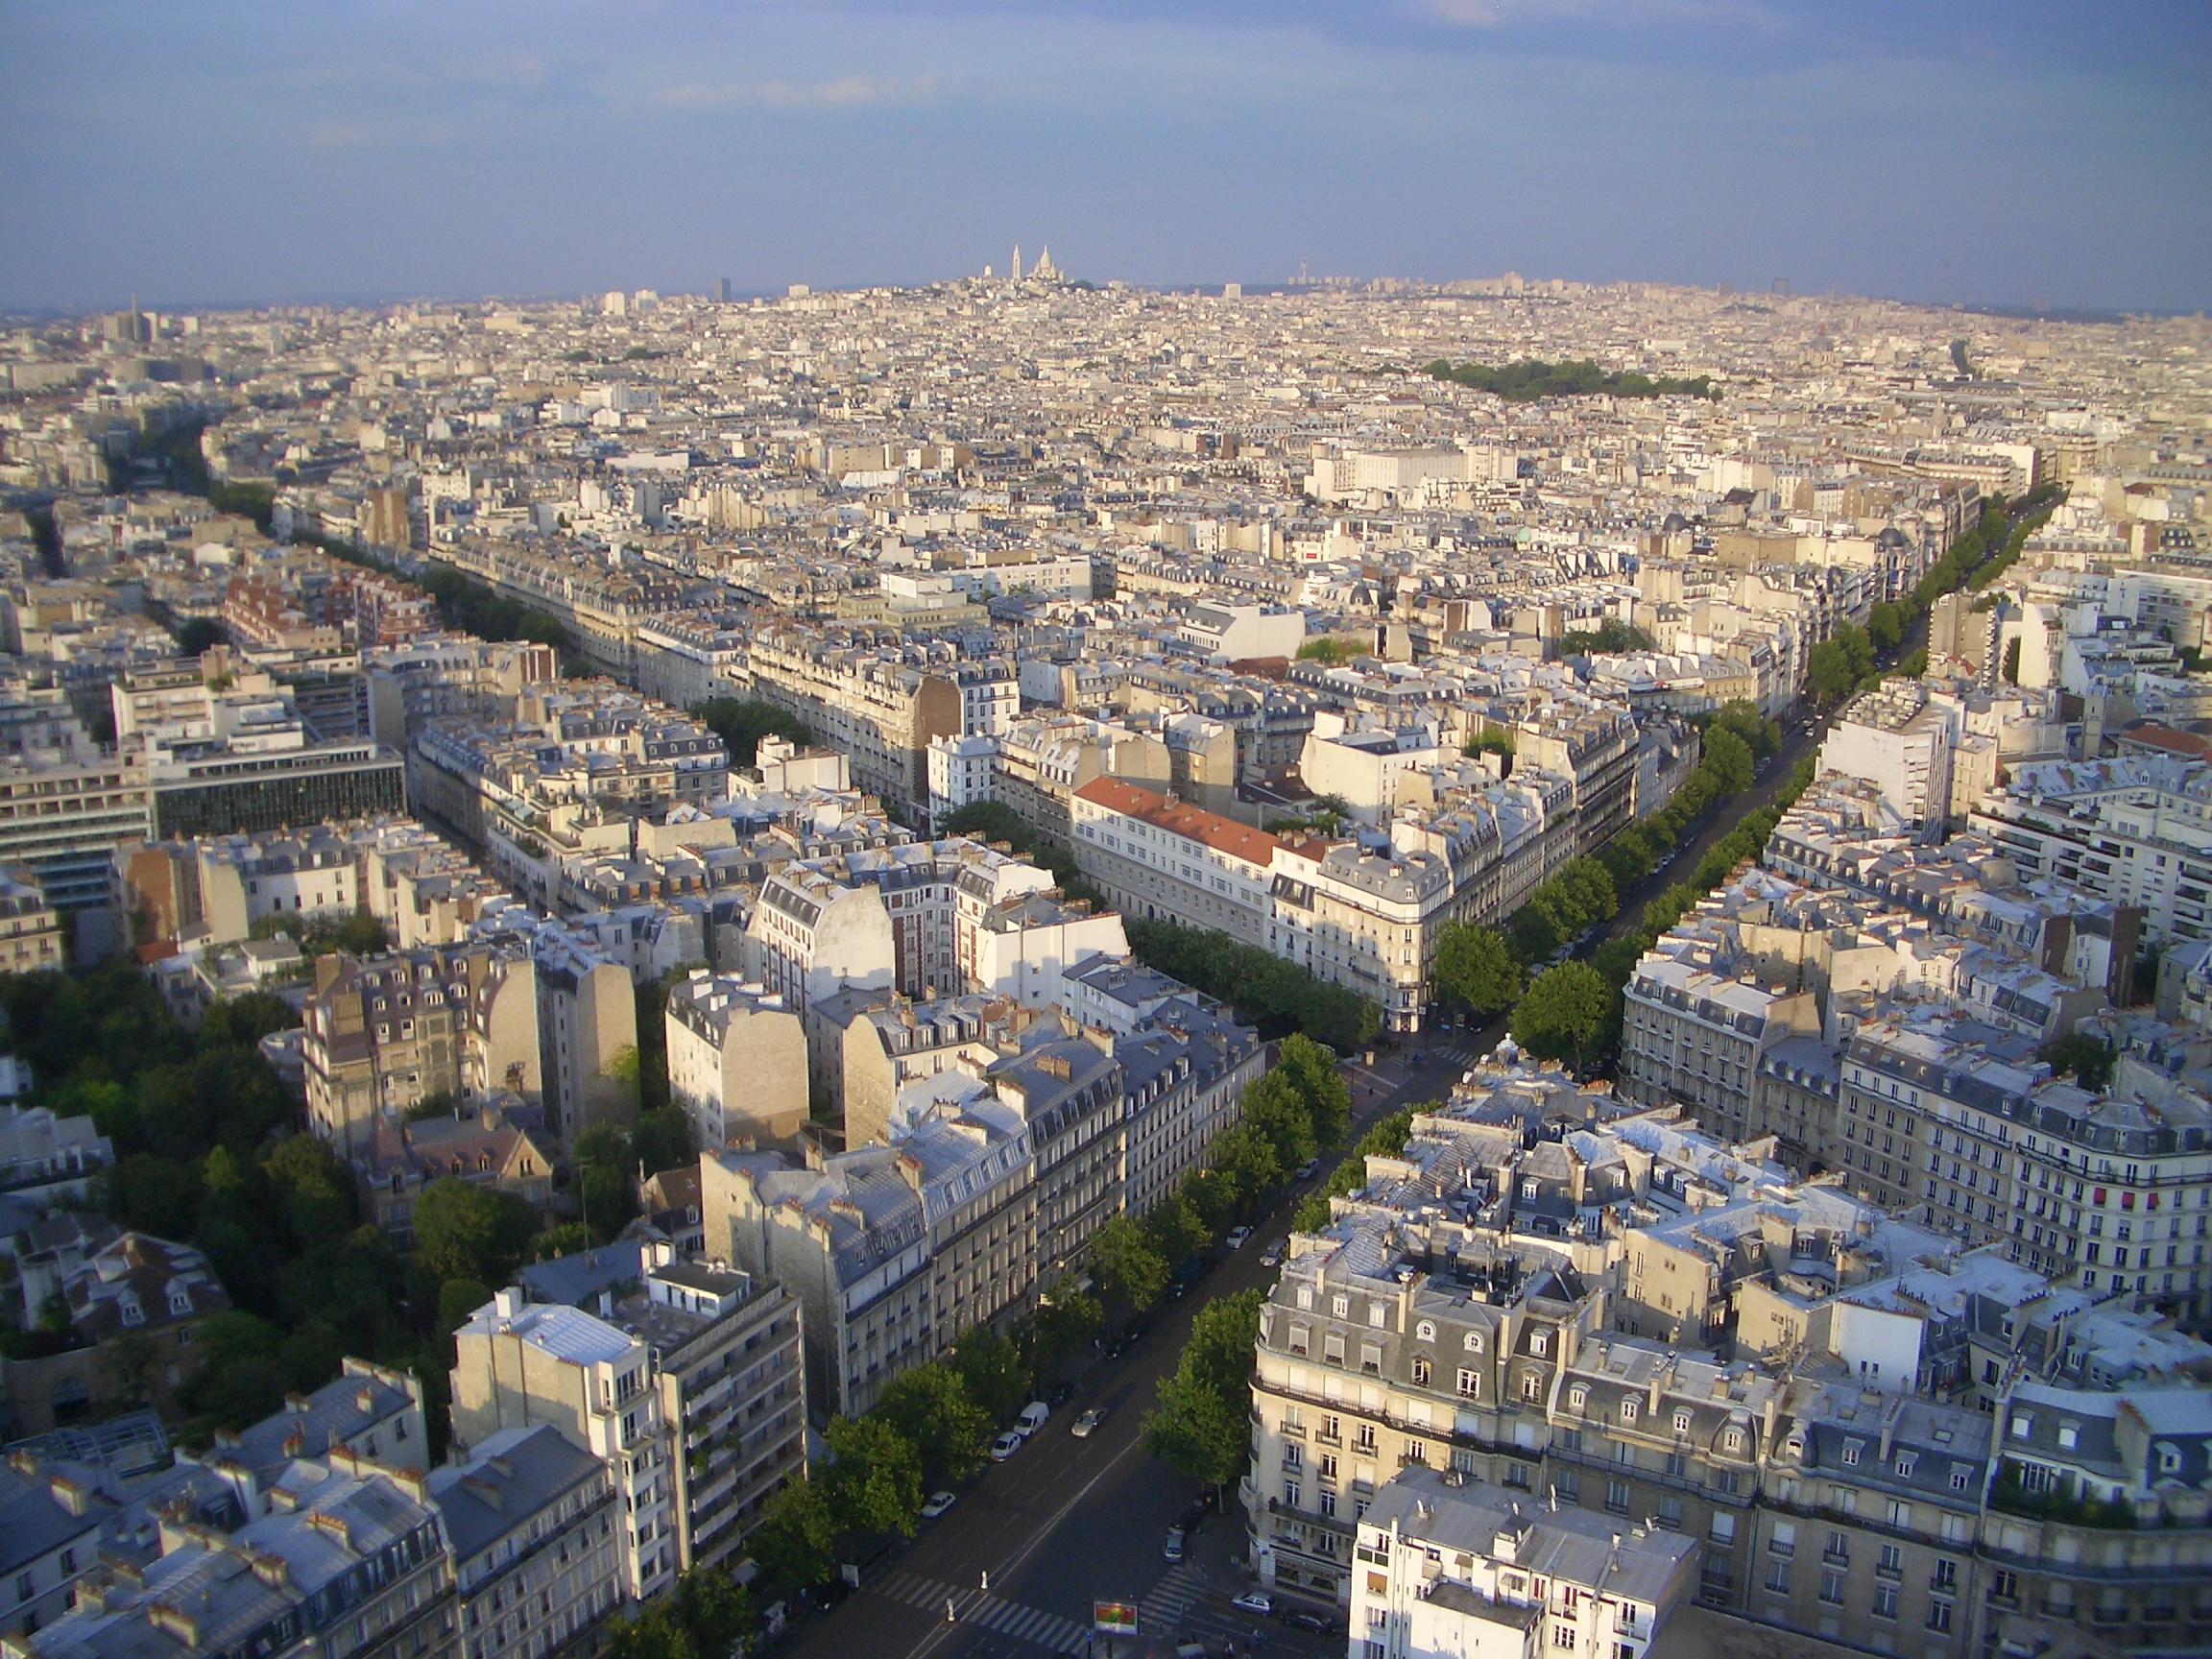 http://worldtravels.markwdanielson.com/myPictures/Paris%200807%20001.jpg